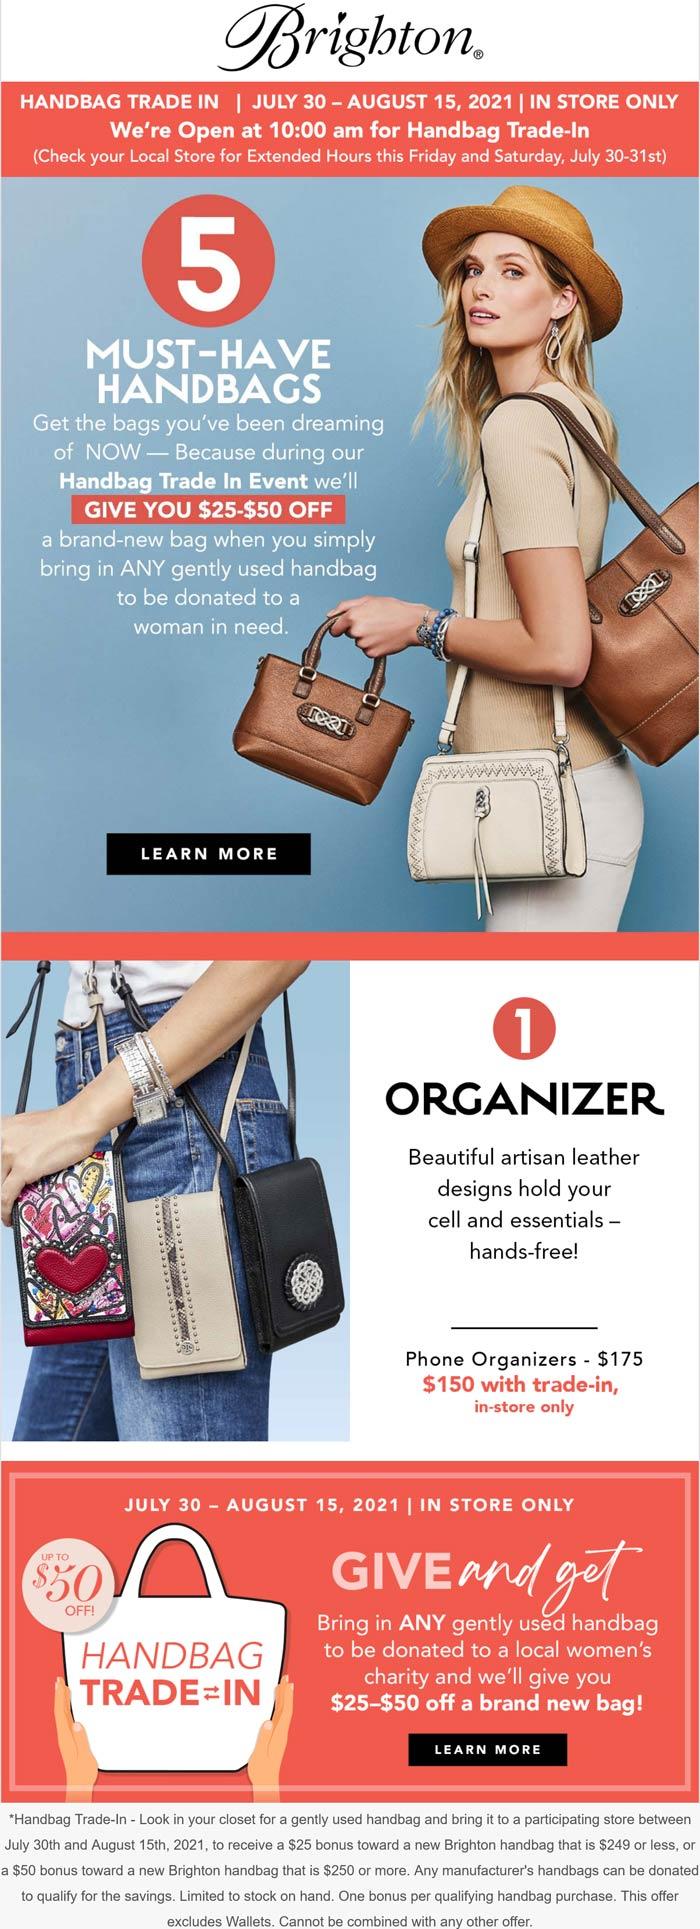 Brighton stores Coupon  Handbag trade in for $25-$50 off new at Brighton #brighton